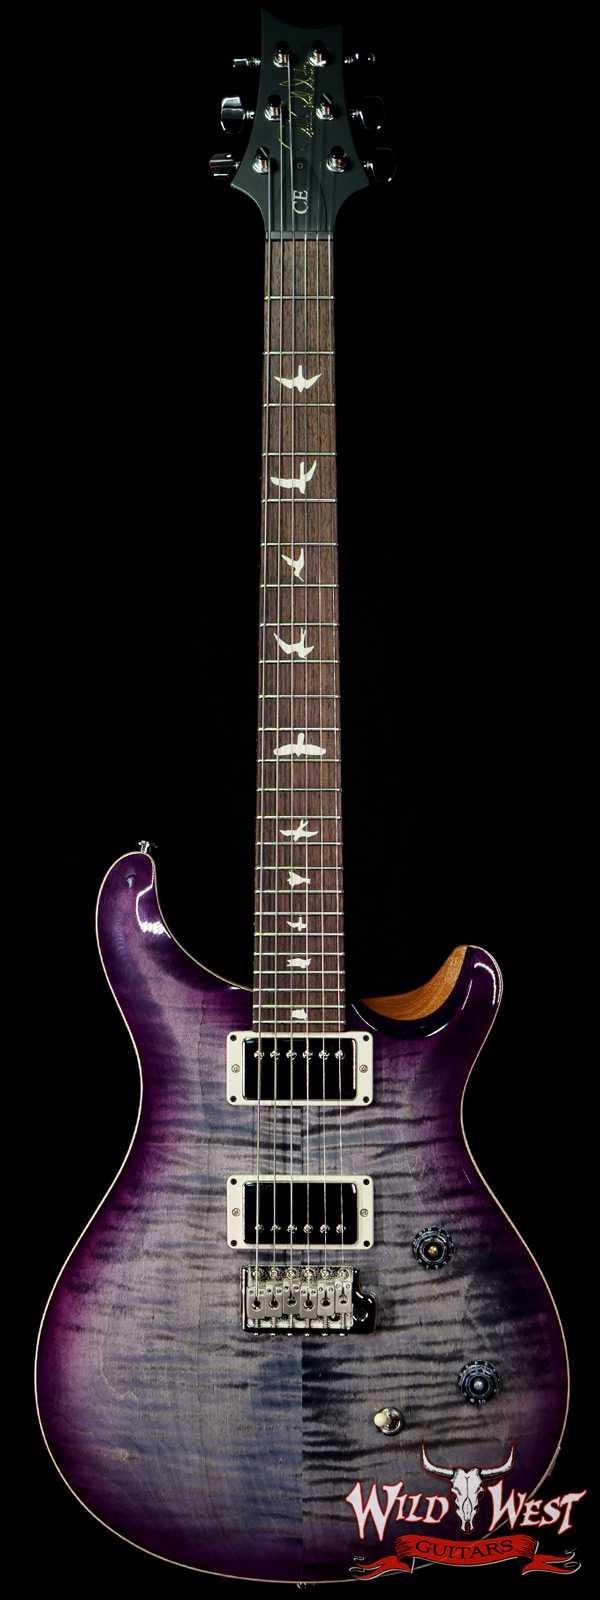 PRS Wild West Guitars Special Run Flame Top Black Neck CE 24 Faded Gray Black Purple Burst 314008